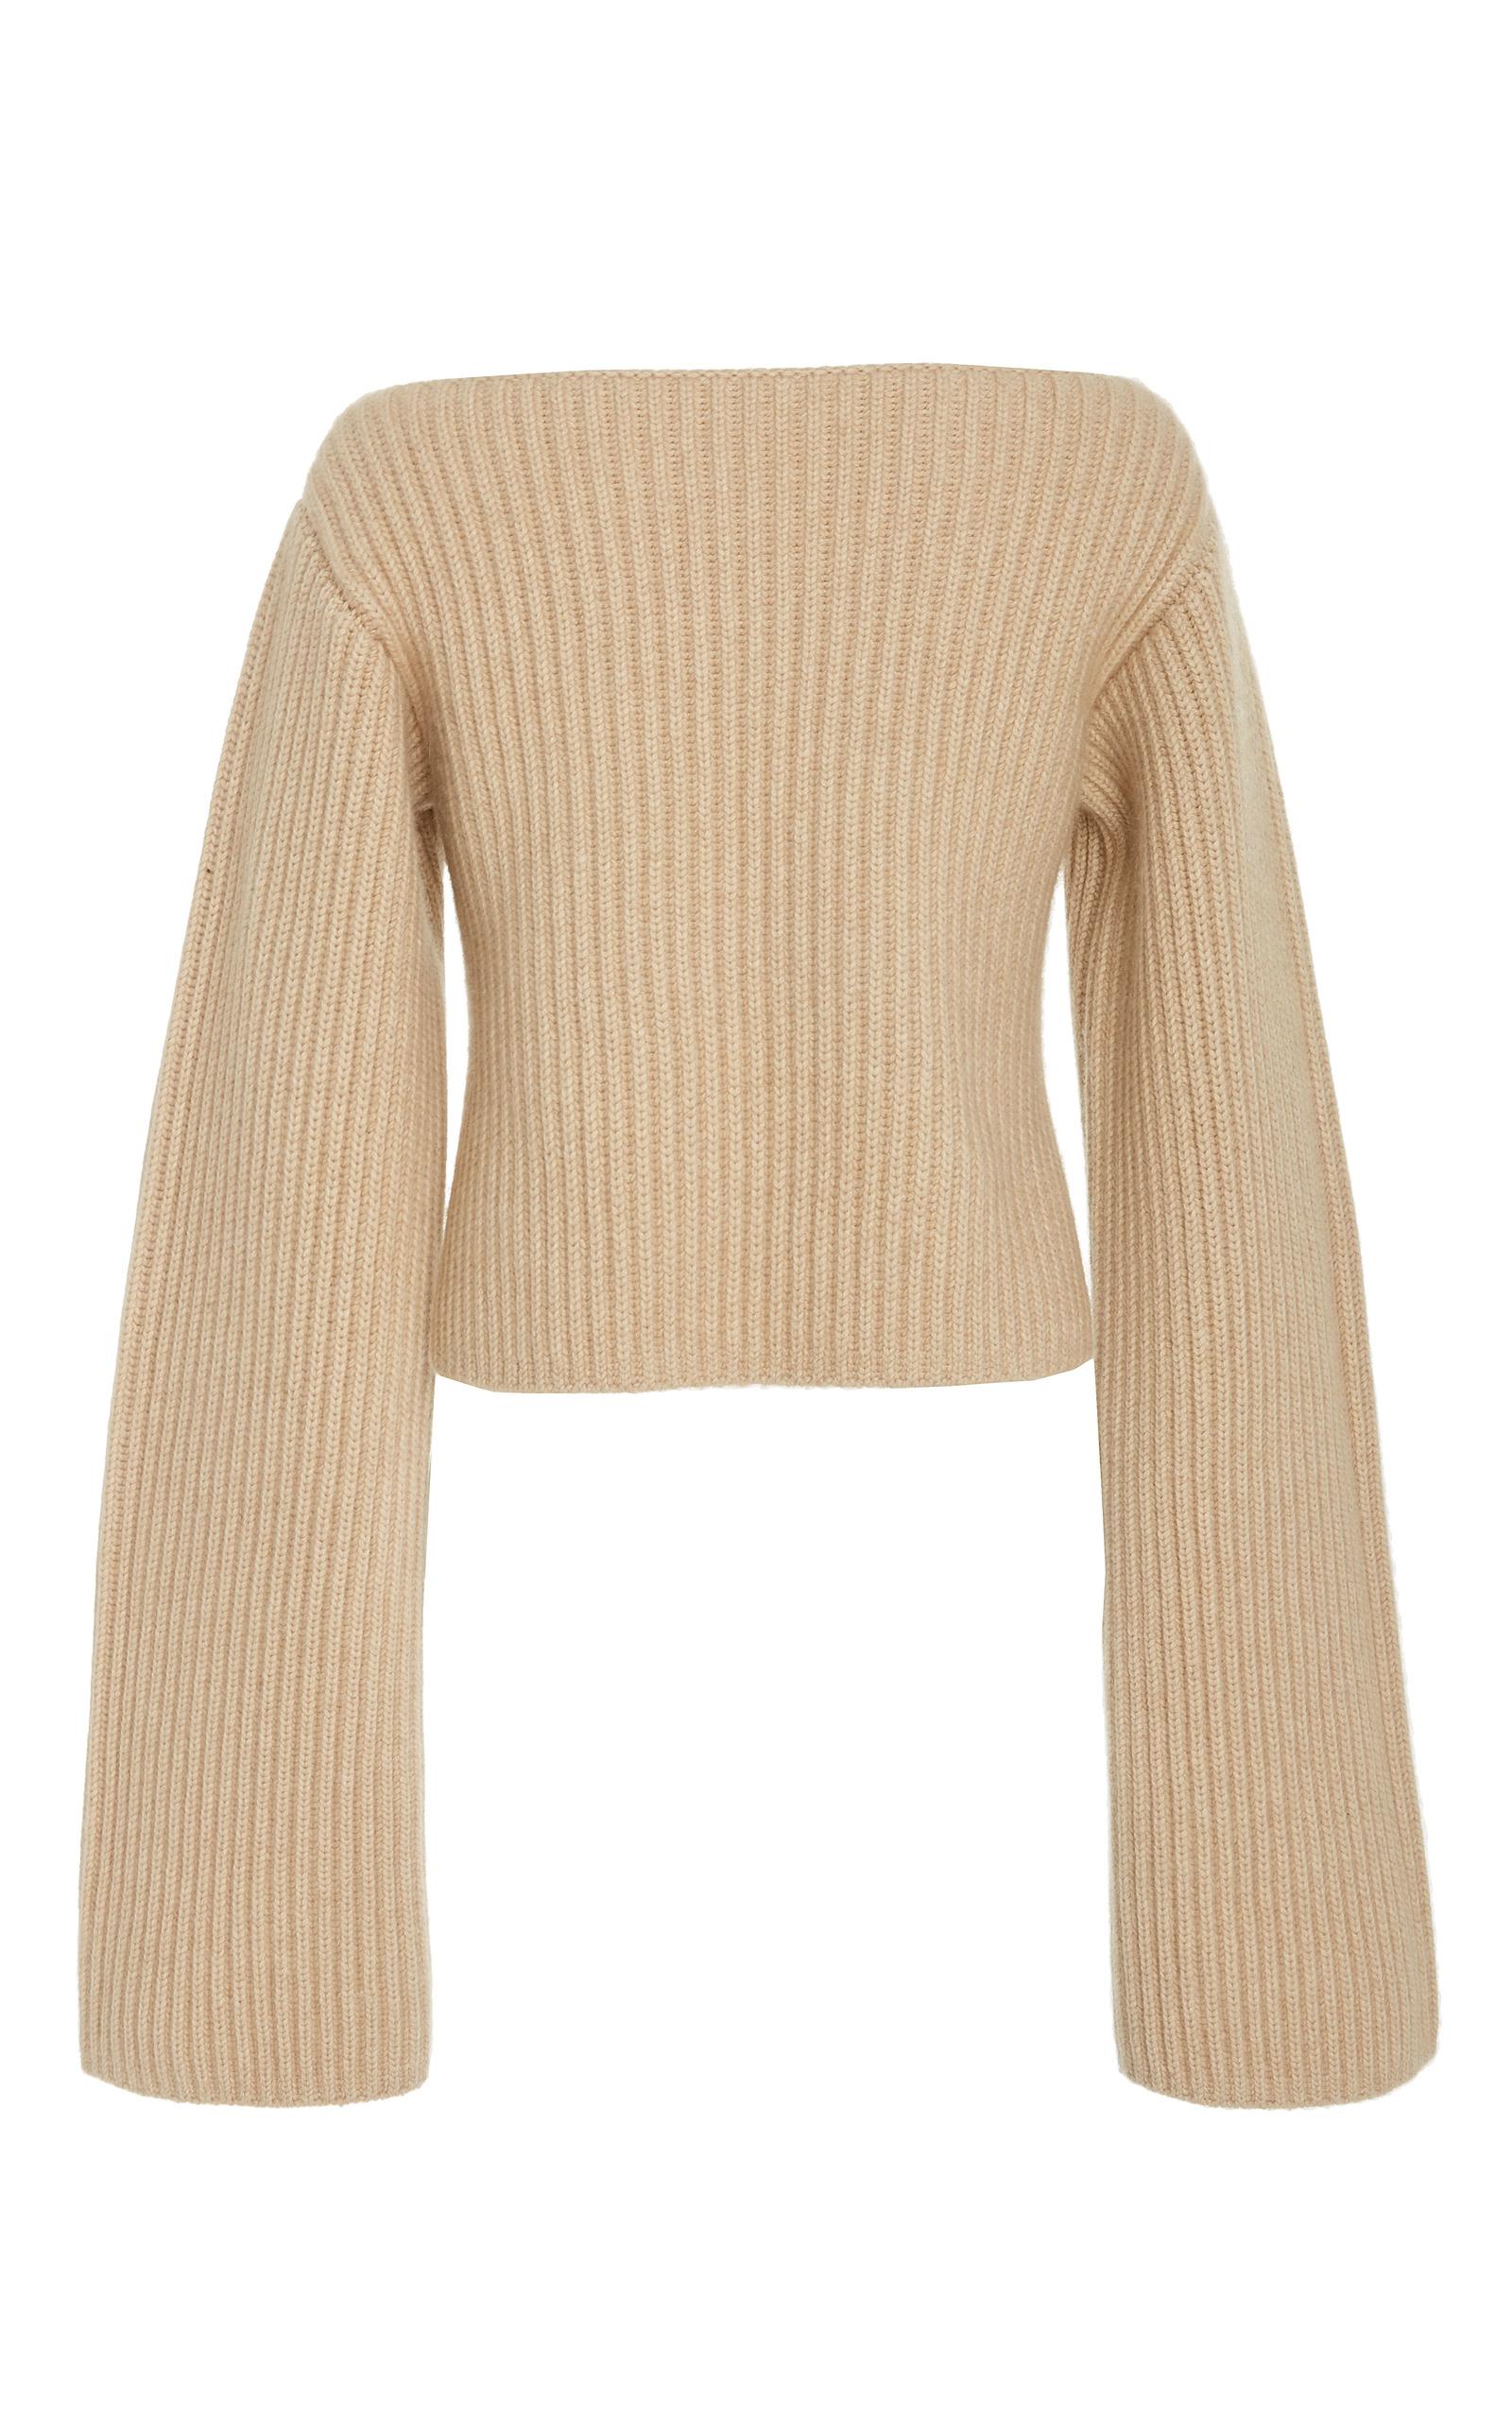 KHAITE Ribbed-Knit Cashmere Sweater, Neutrals ModeSens